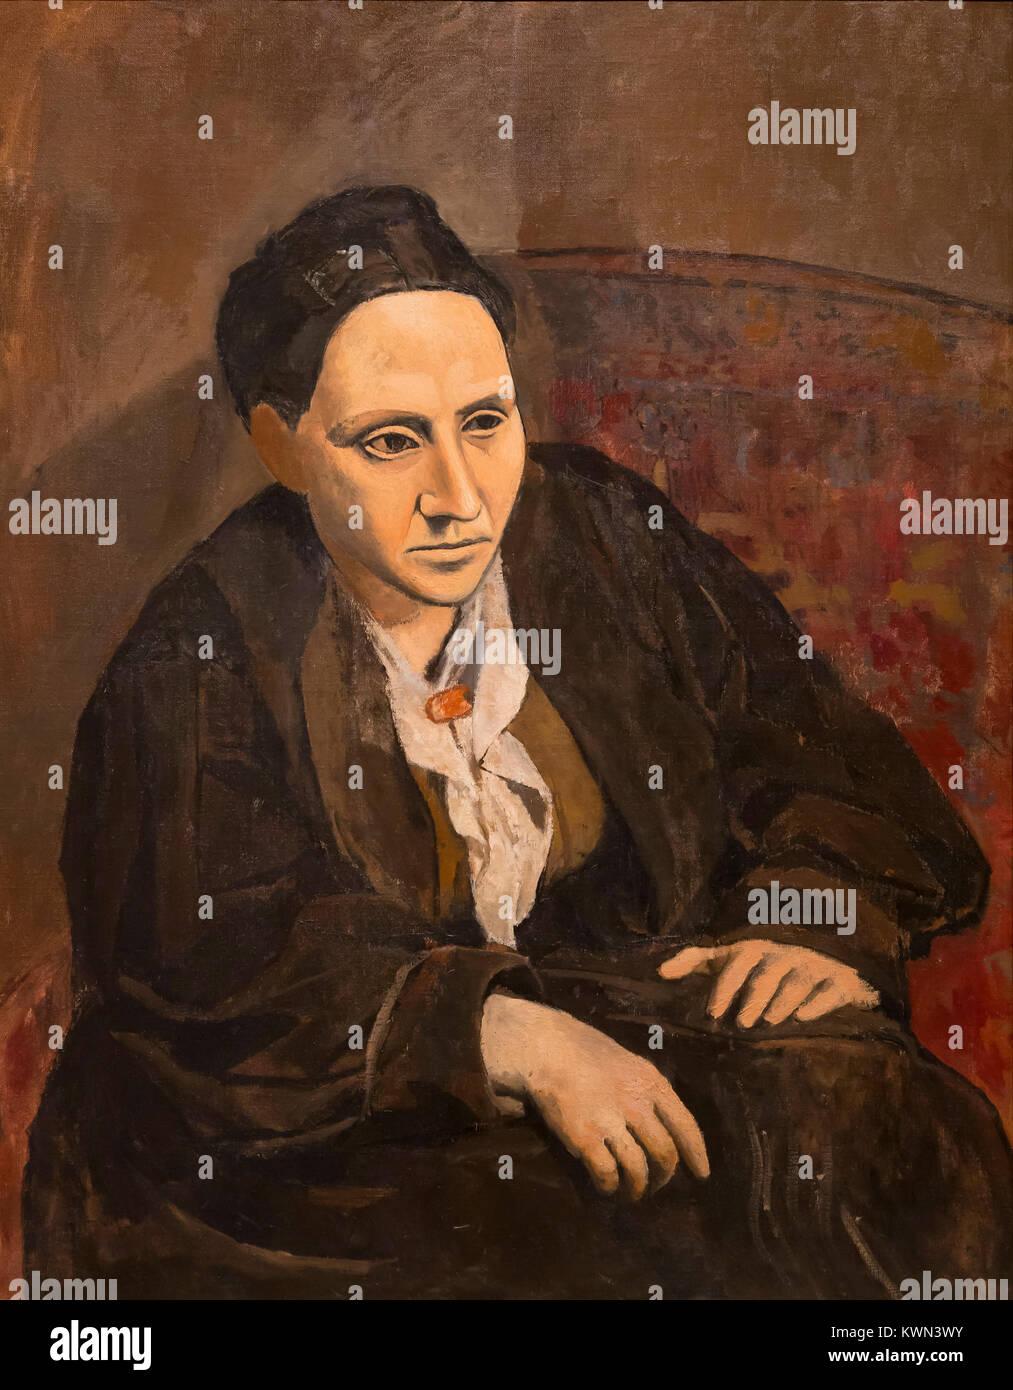 Gertrude Stein, Pablo Picasso, 1905-1906, Stockbild